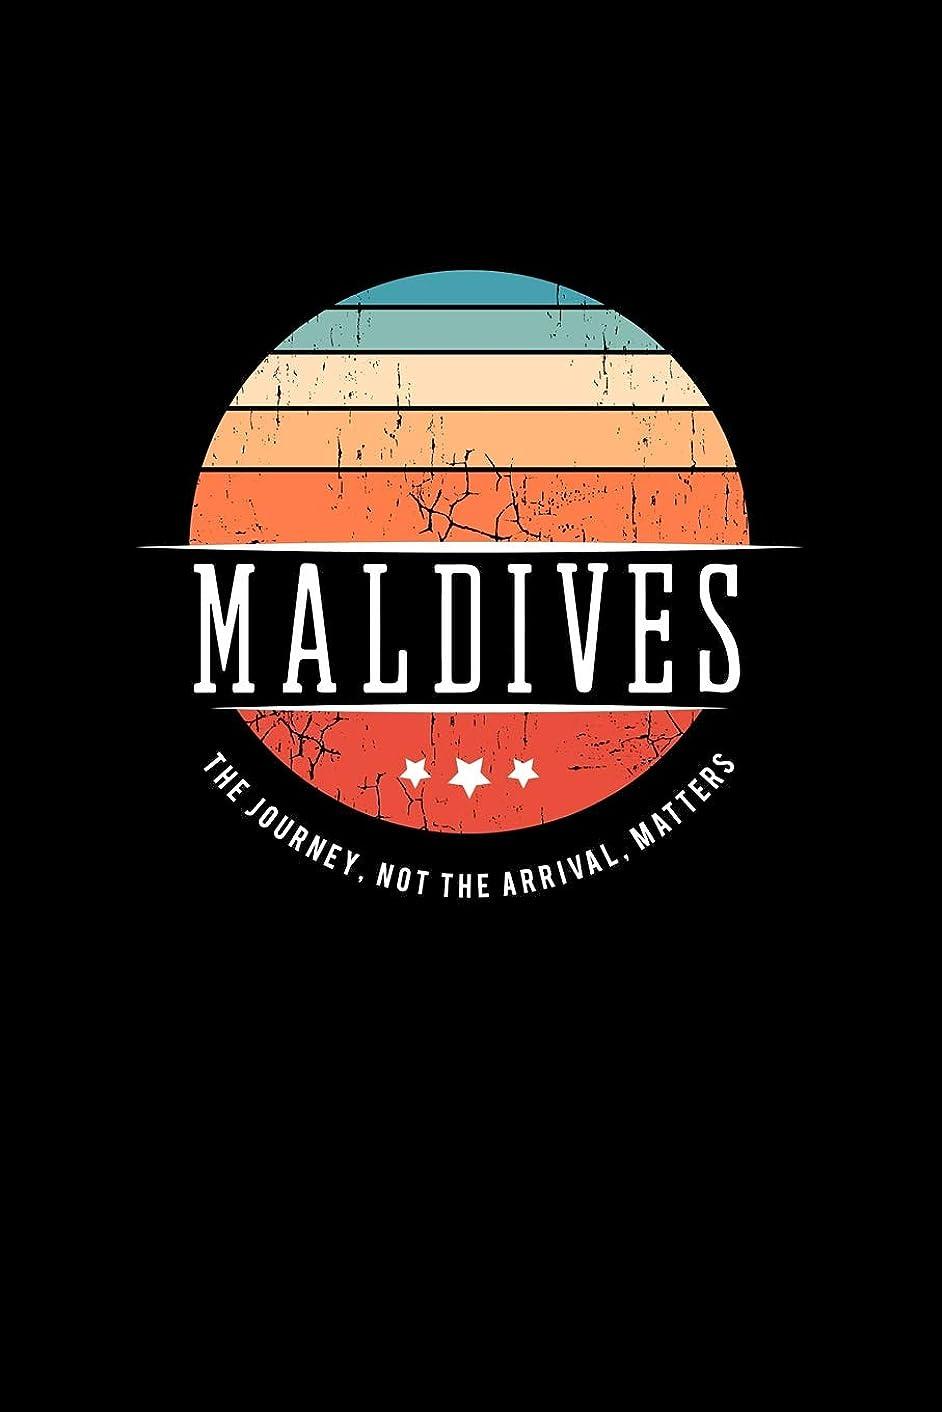 Maldives: Vintage World Travel Keepsake Blank Journal Notebook